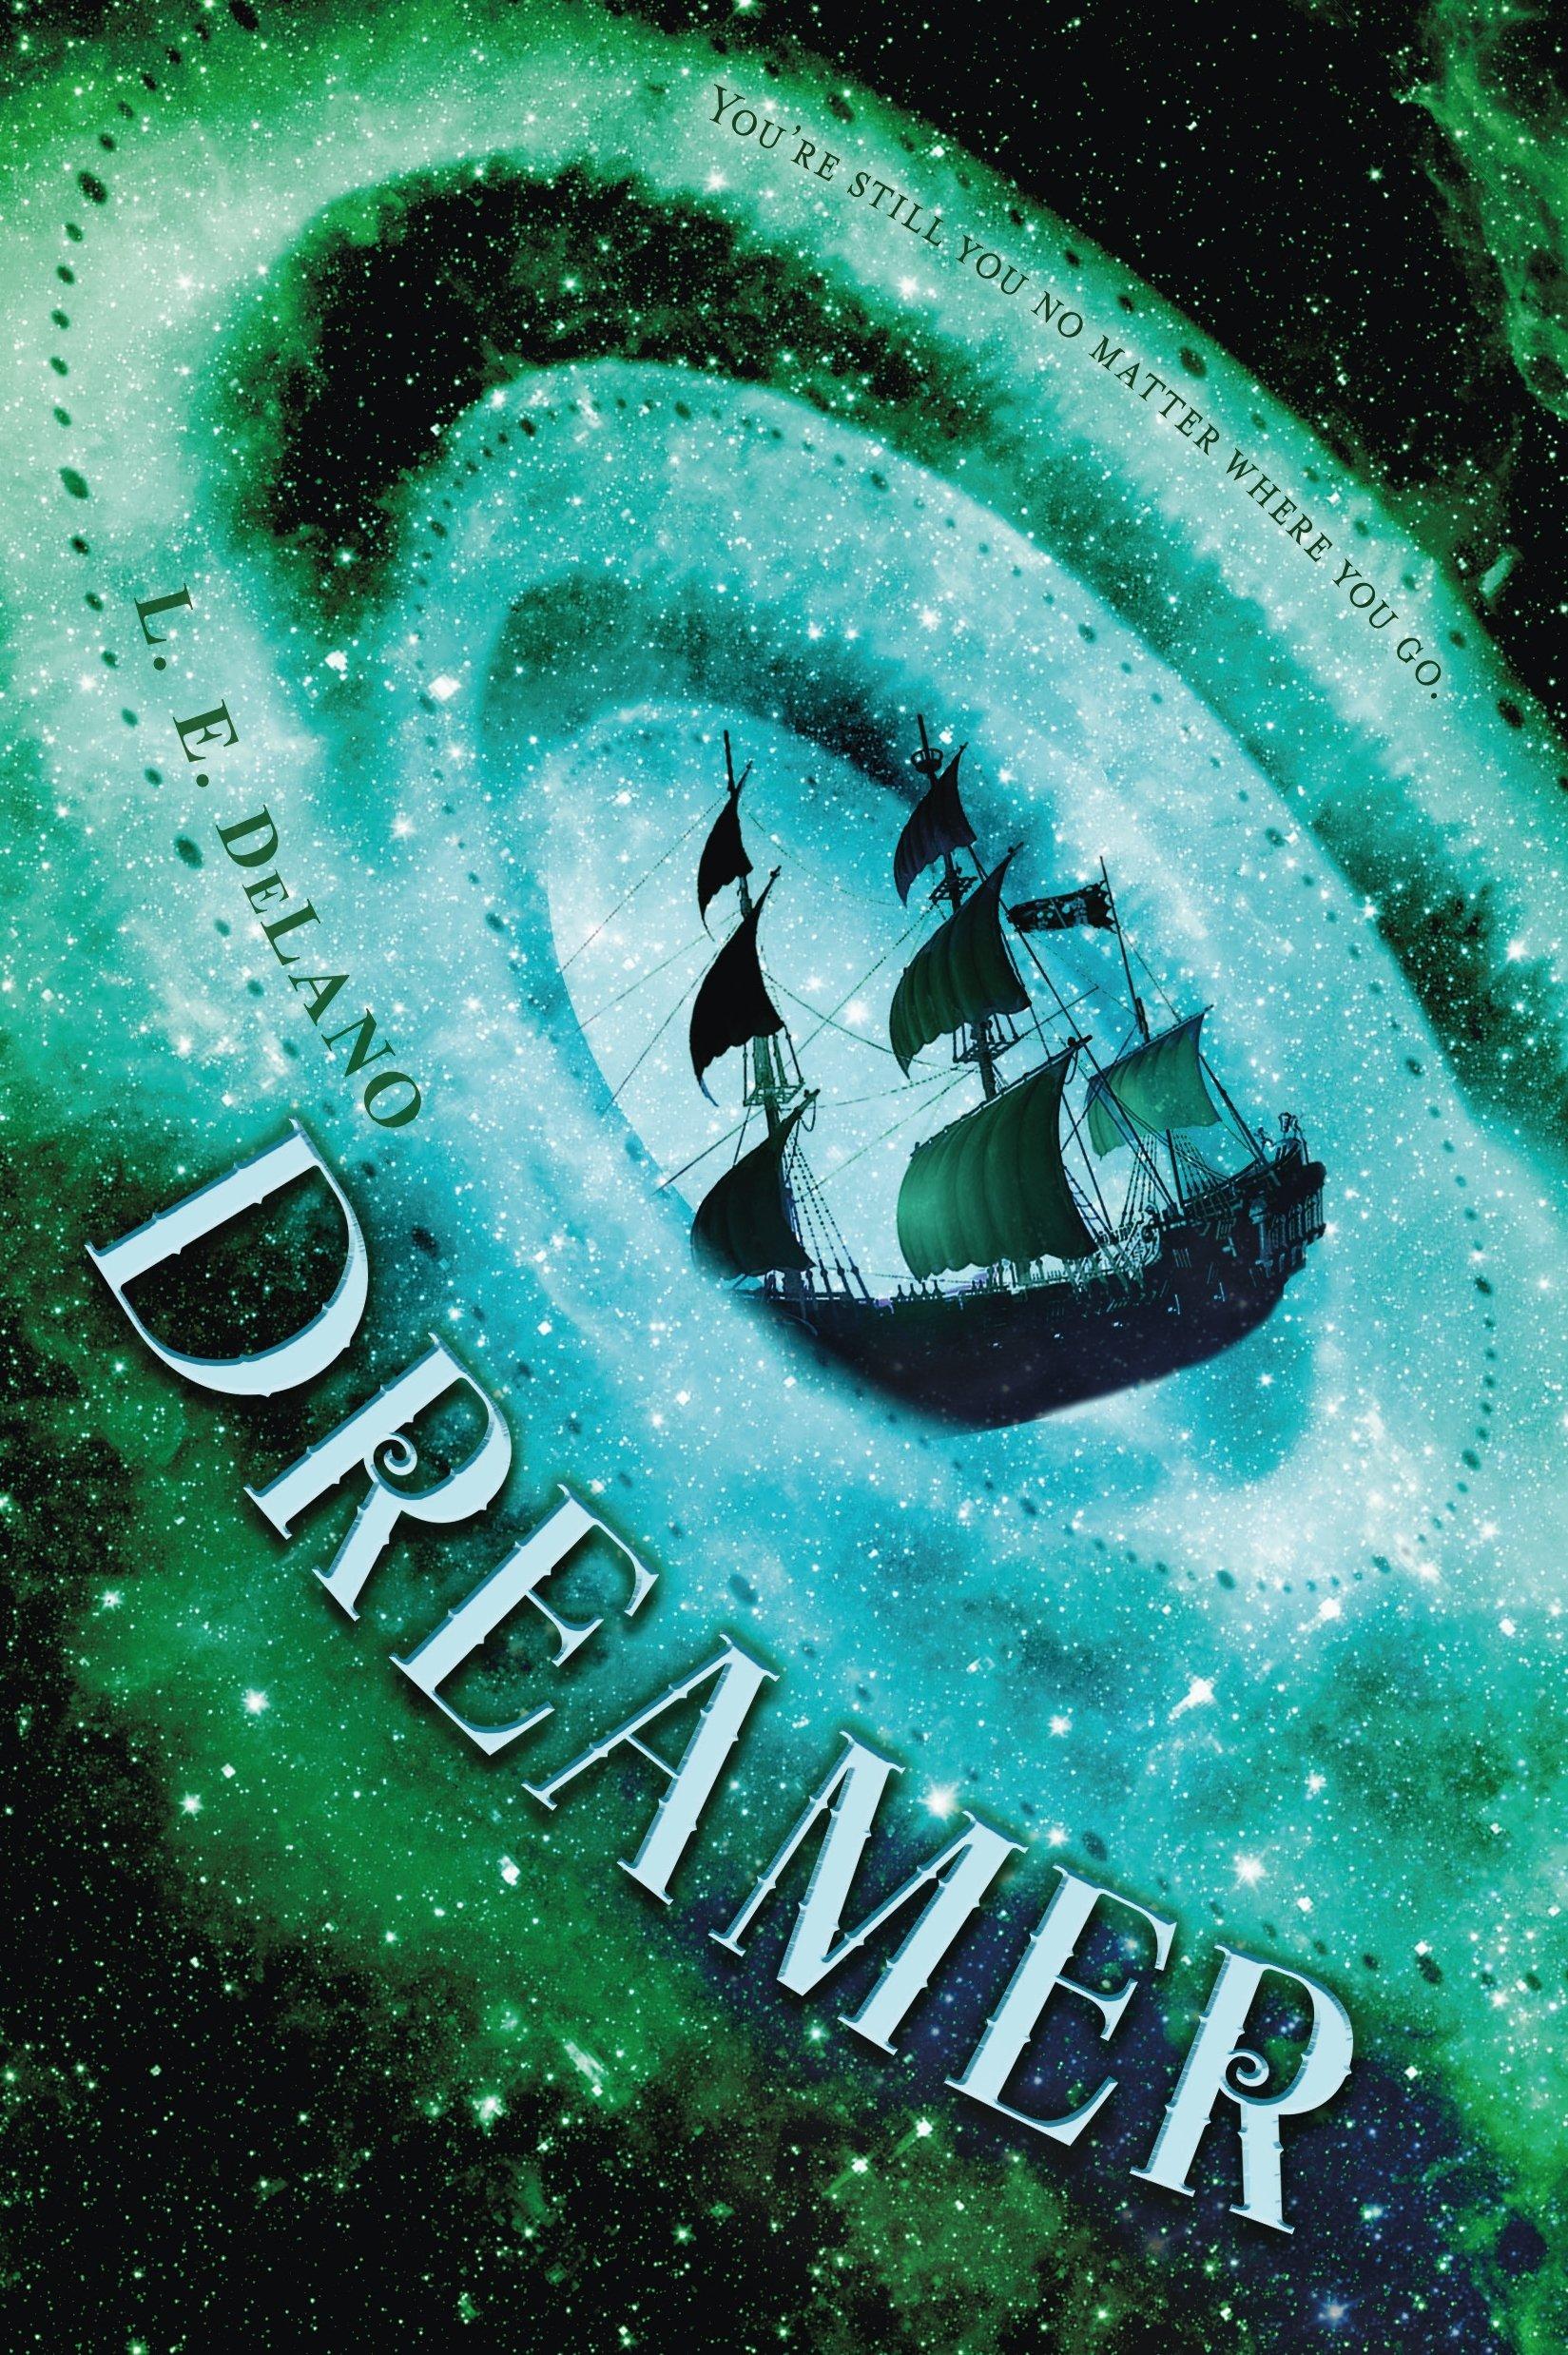 Amazon.com: Dreamer (Traveler) (9781250100429): L.E. DeLano: Books